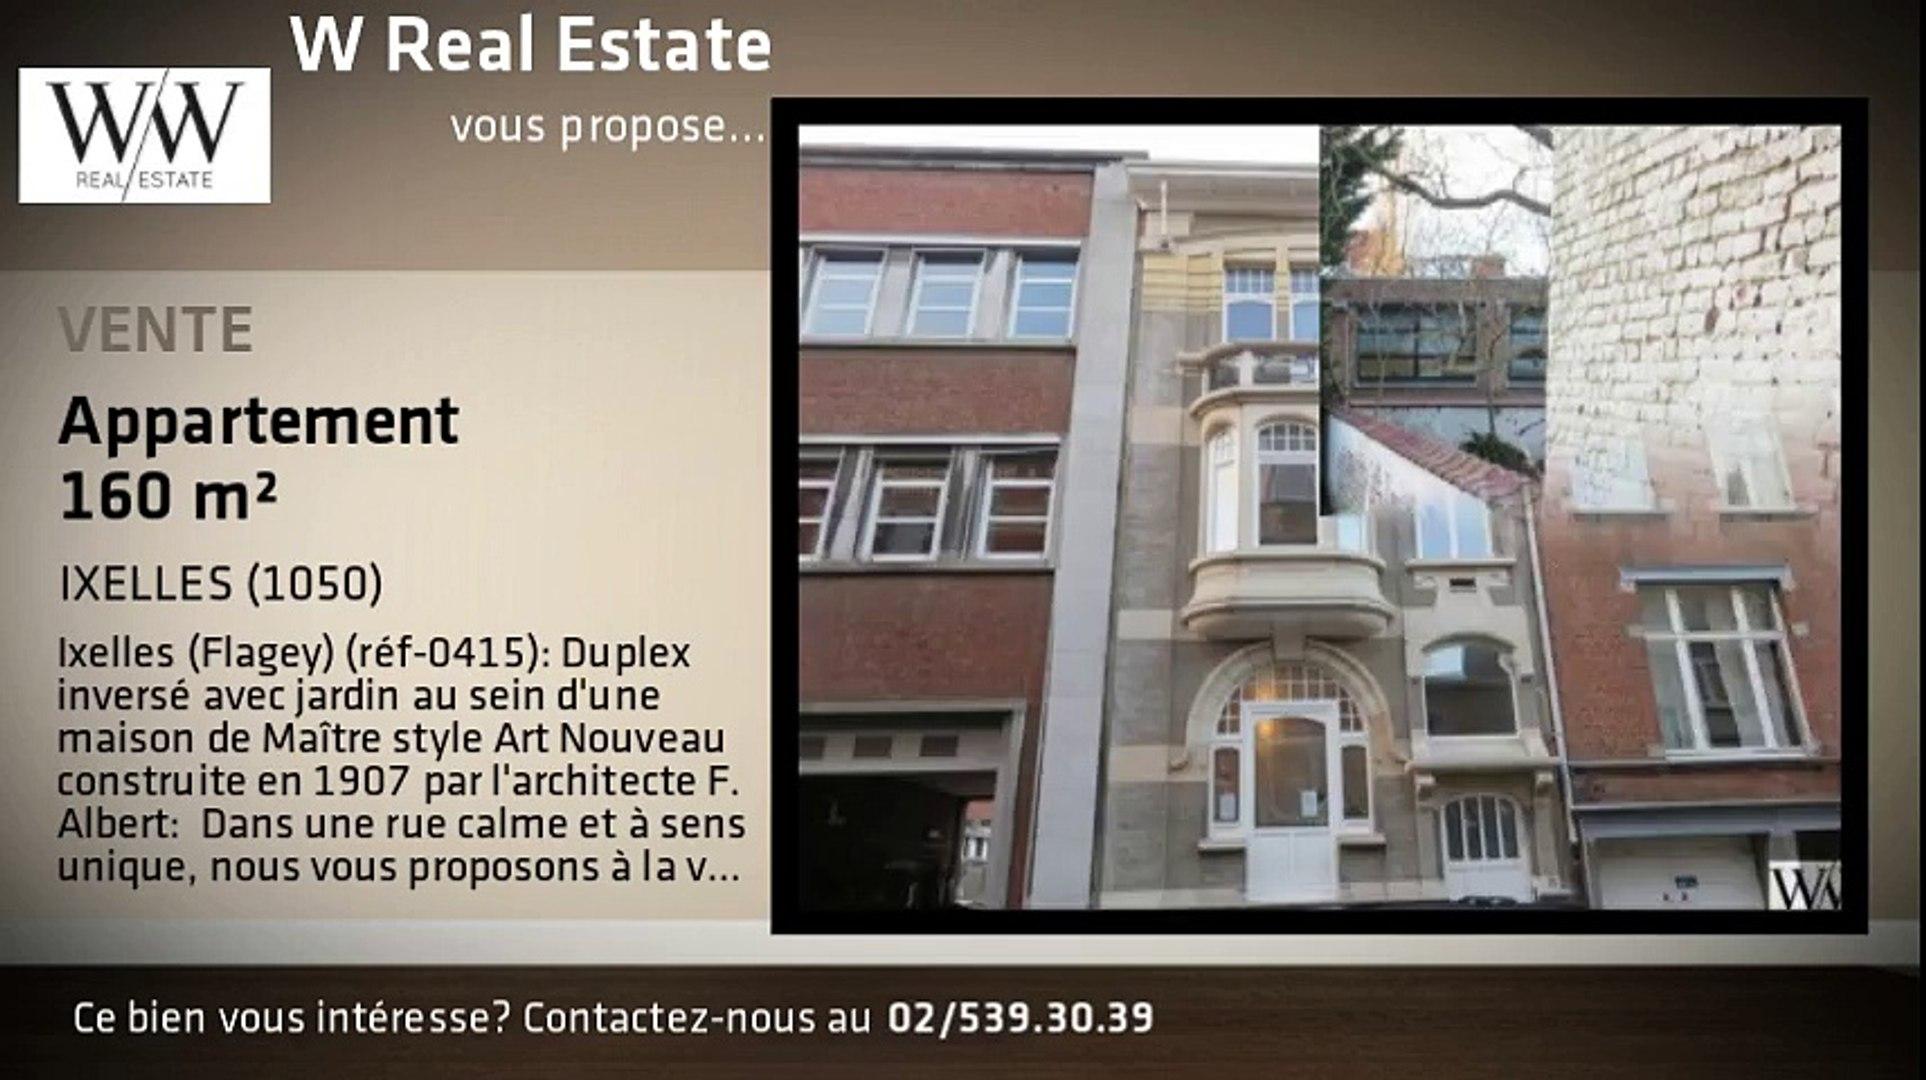 A Vendre Appartement Ixelles 1050 160m Video Dailymotion